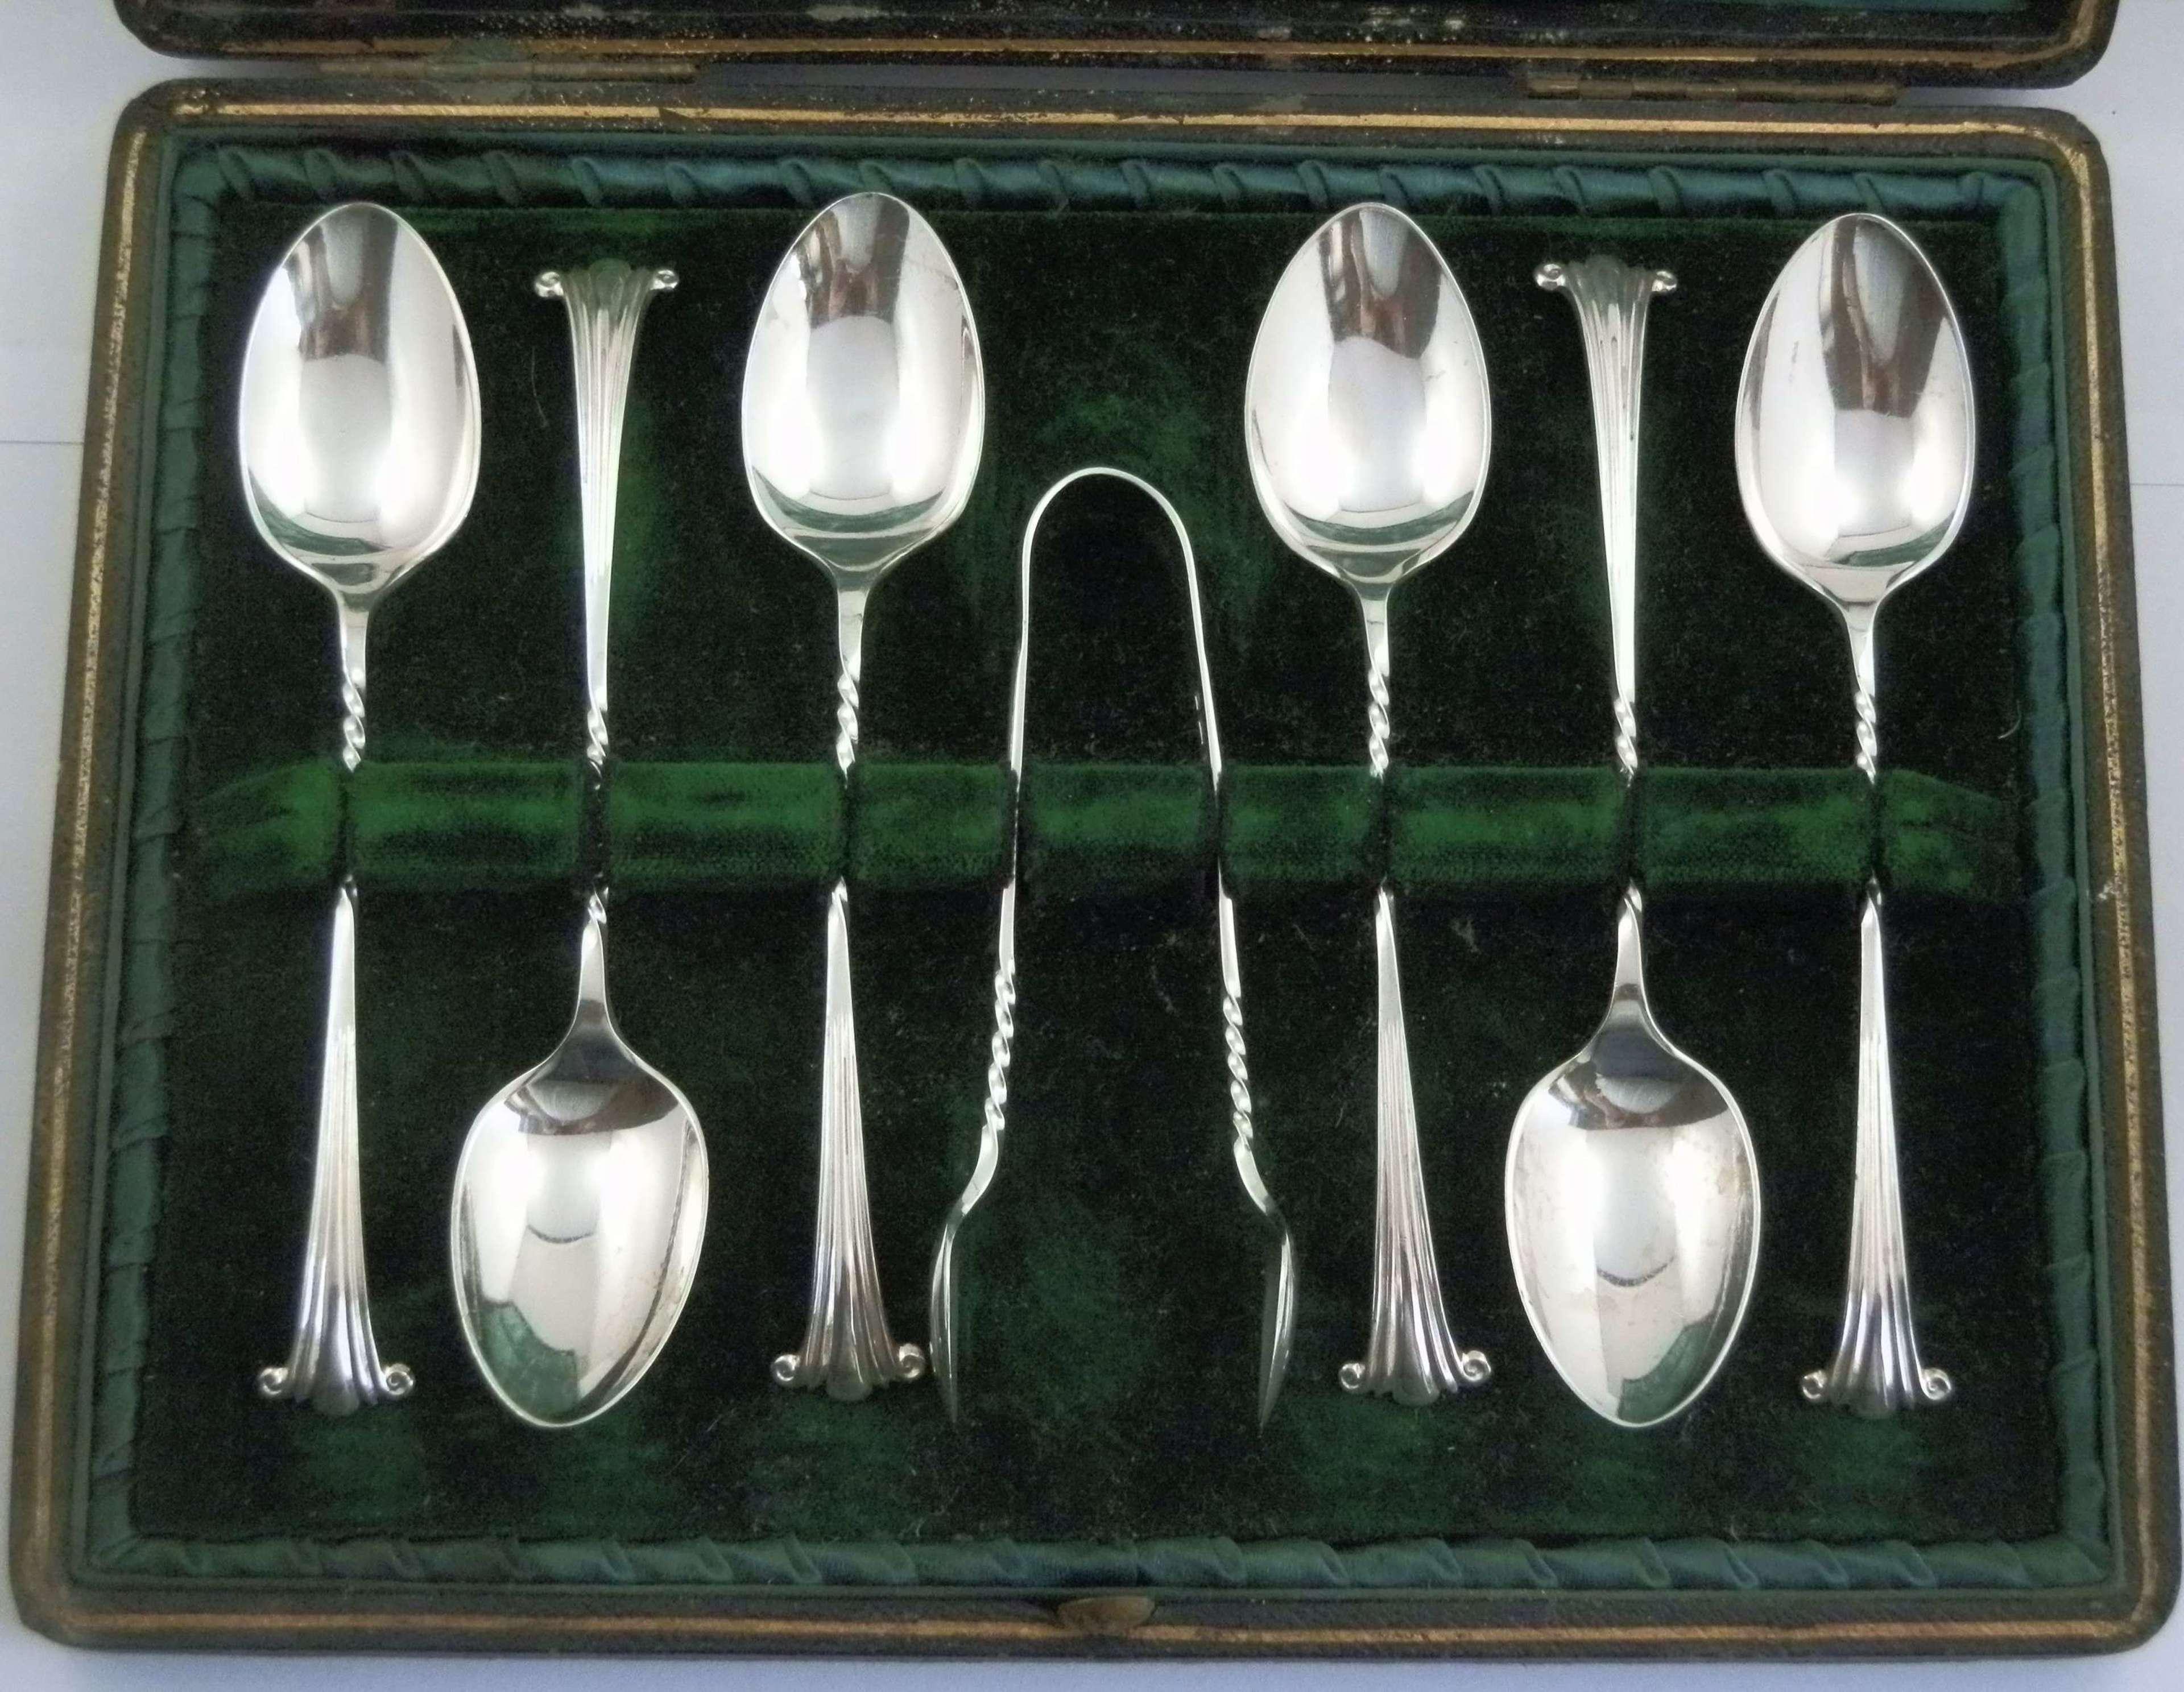 Edwardian teaspoon set, Birmingham 1904